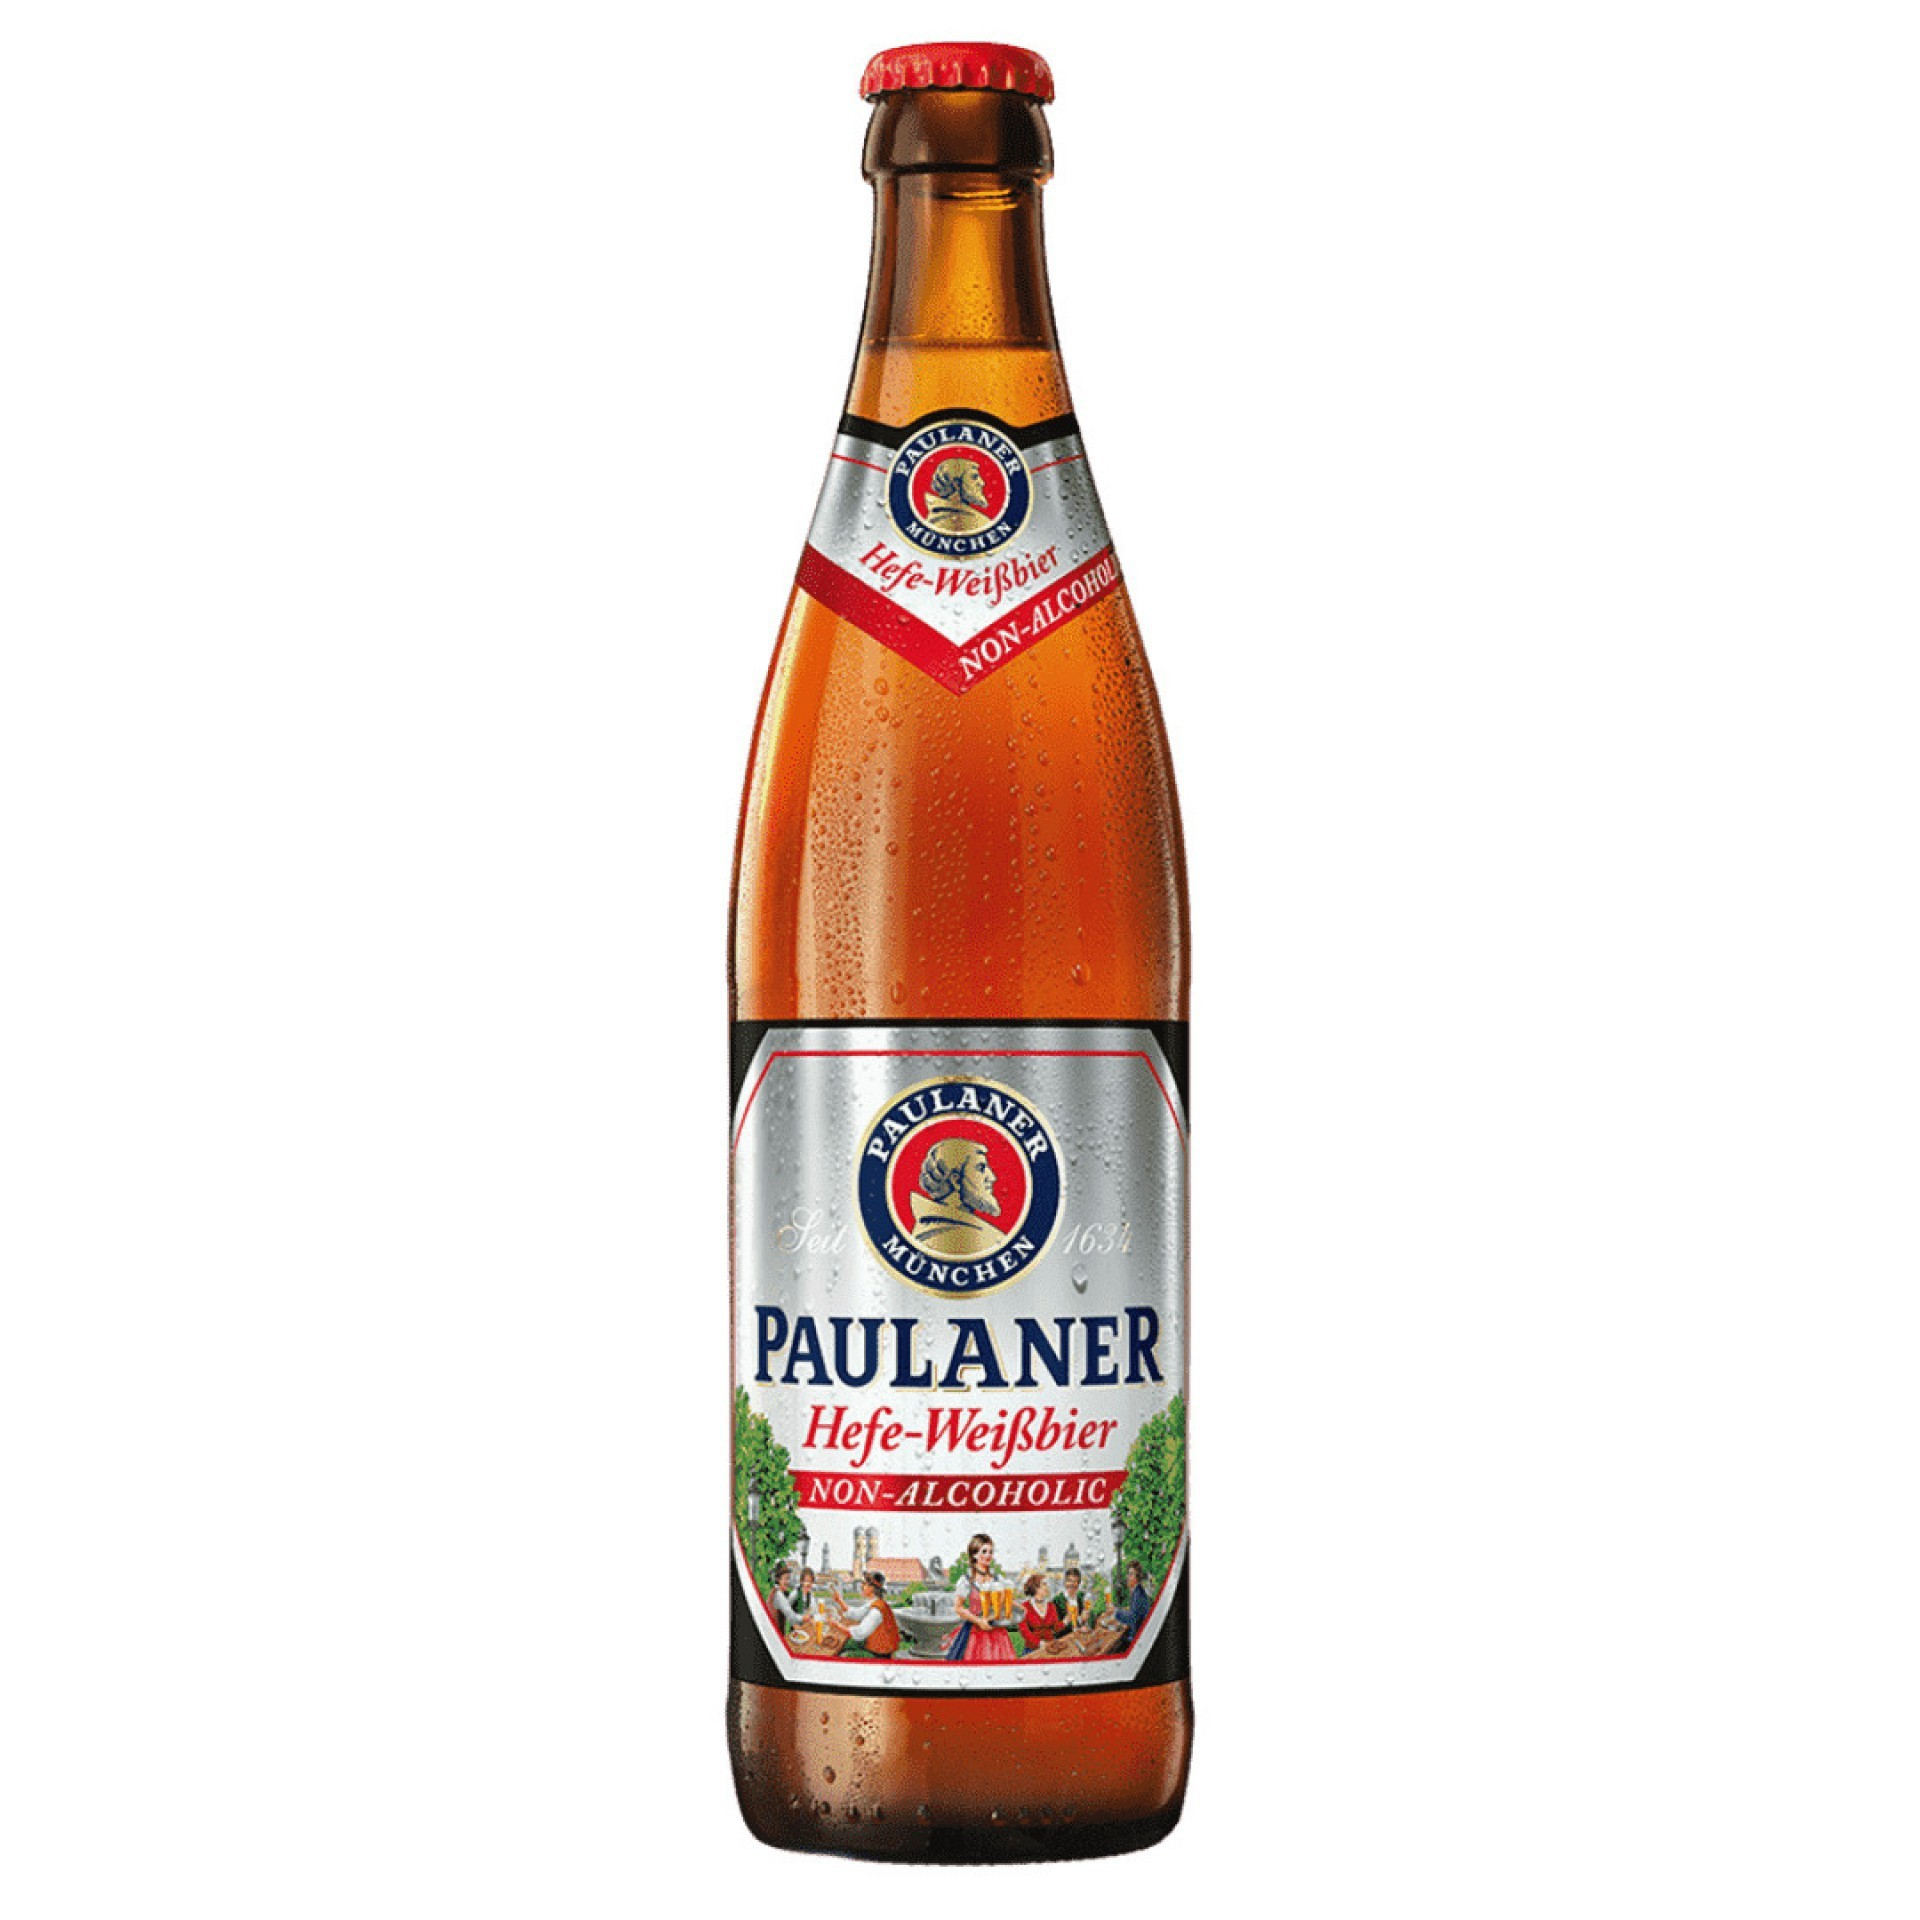 (Foto: Reprodução/Internet)Cerveja sem Álcool Paulaner Hefe Weissbier Garrafa 500ml - R$ 21,90 (iFood)